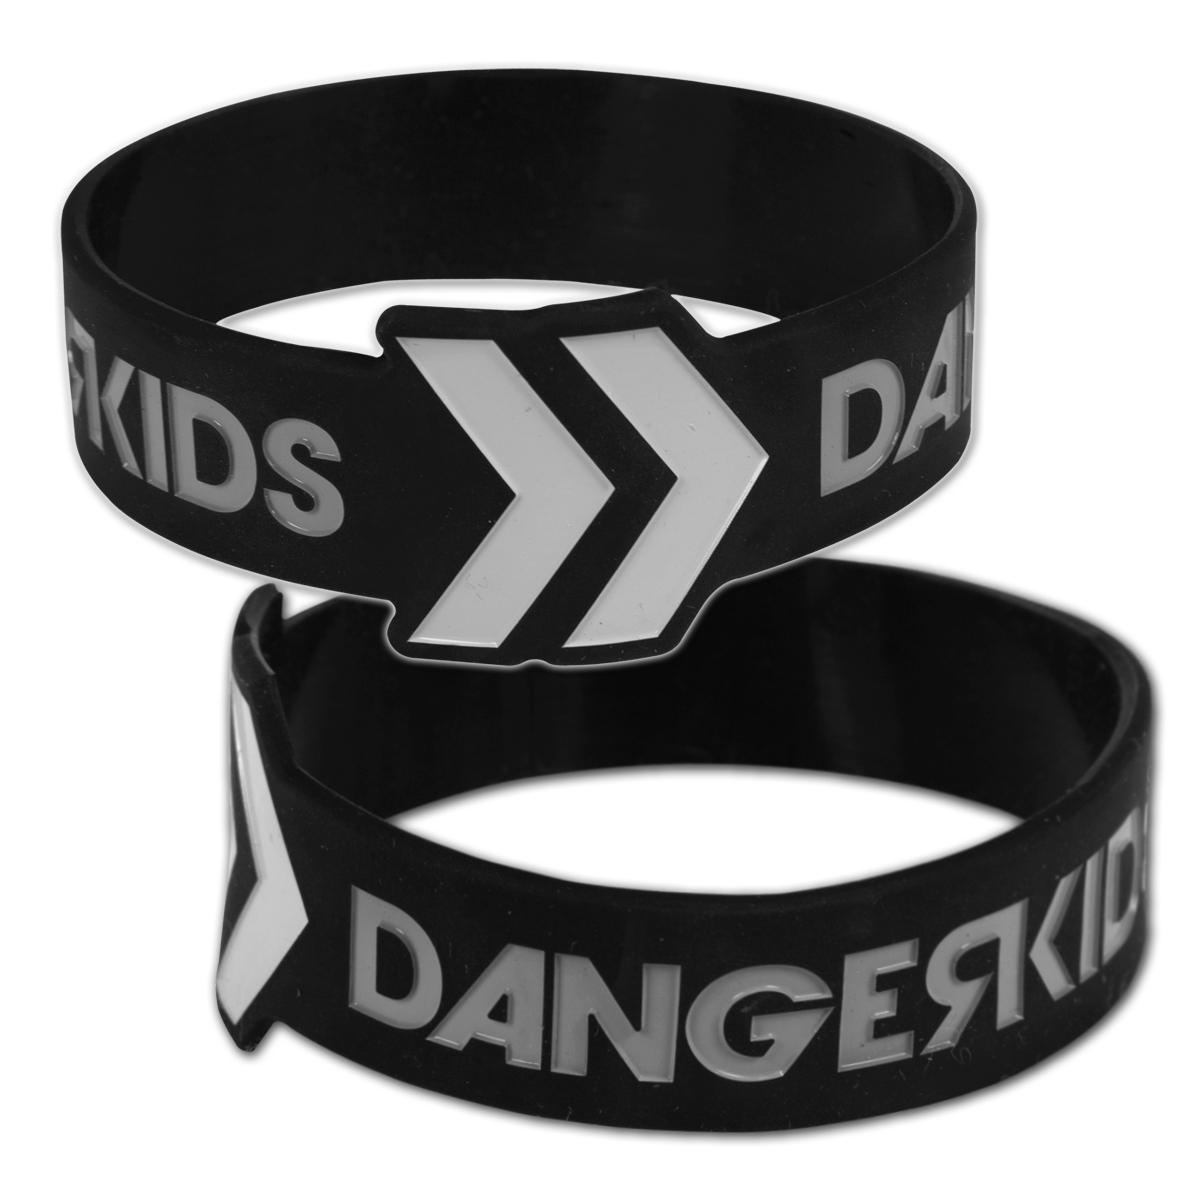 Dangerkids Logo Rubber Bracelet